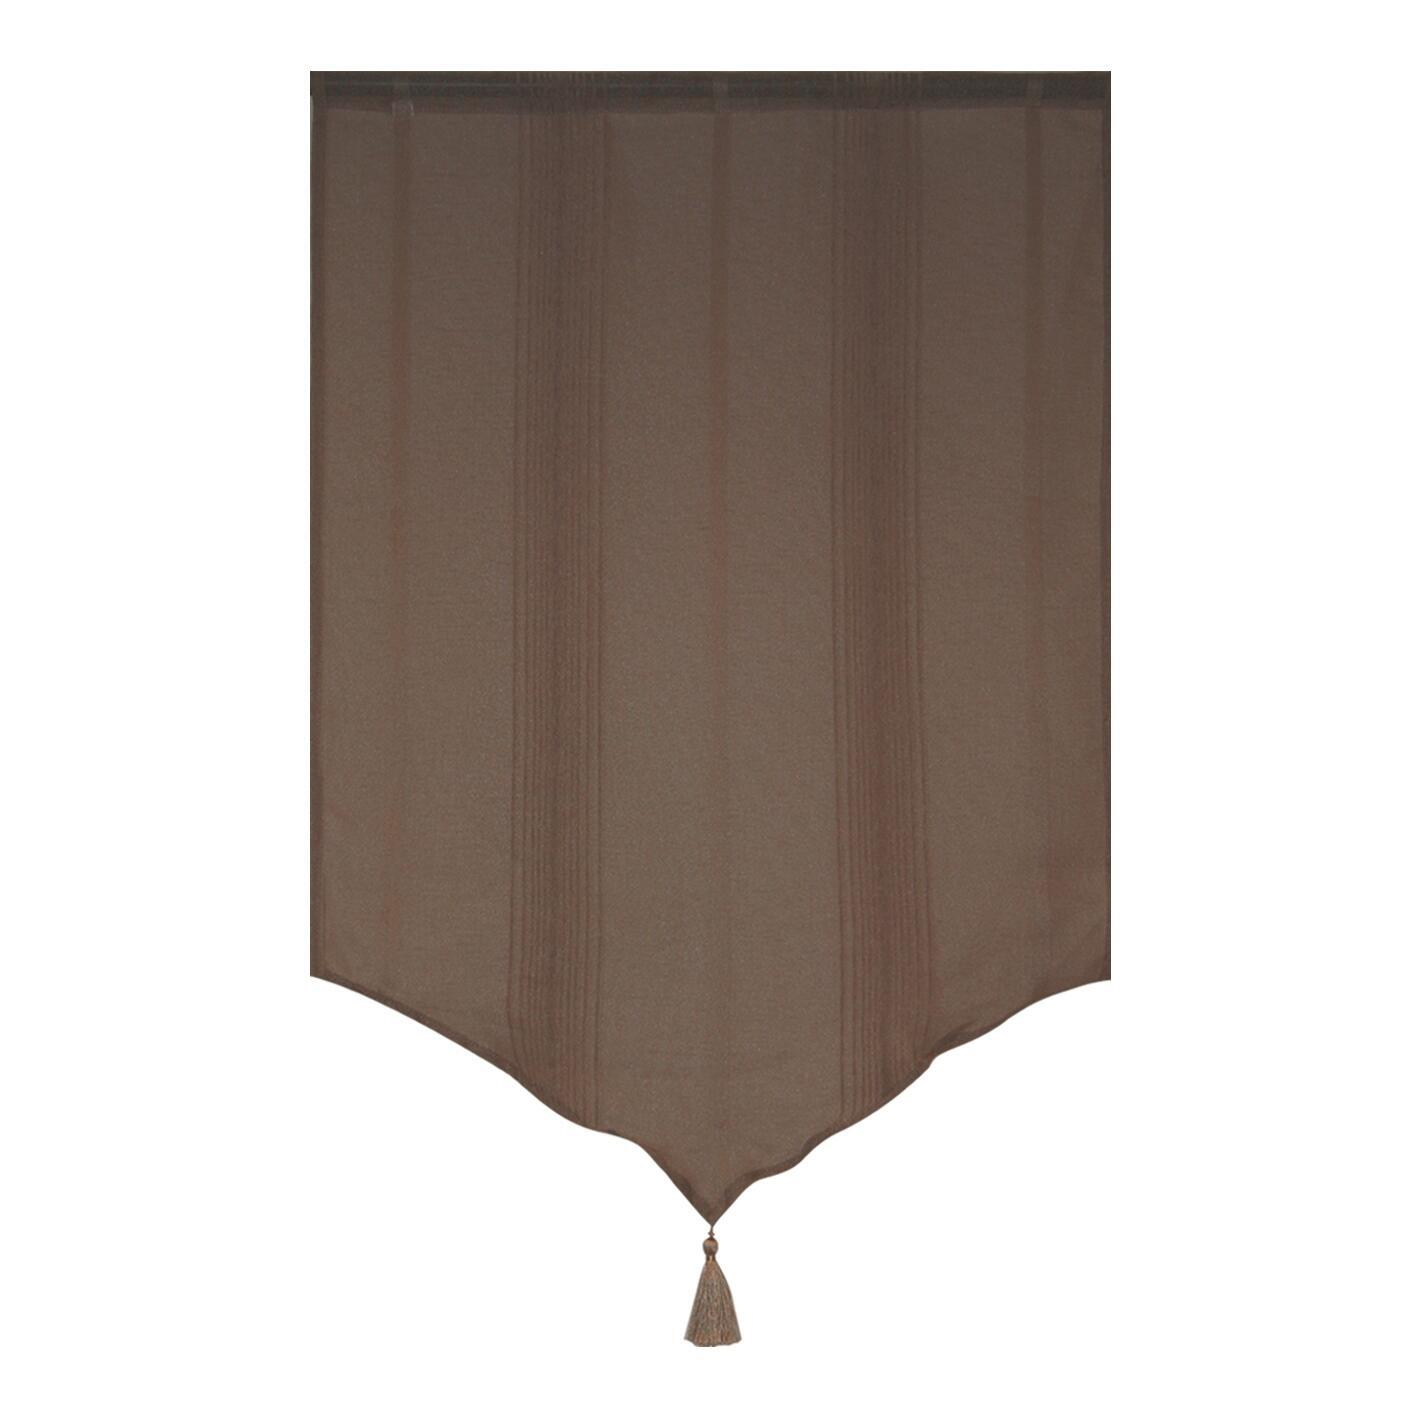 Tendina vetro Marrone mattone passanti nascosti 60 x 90 cm